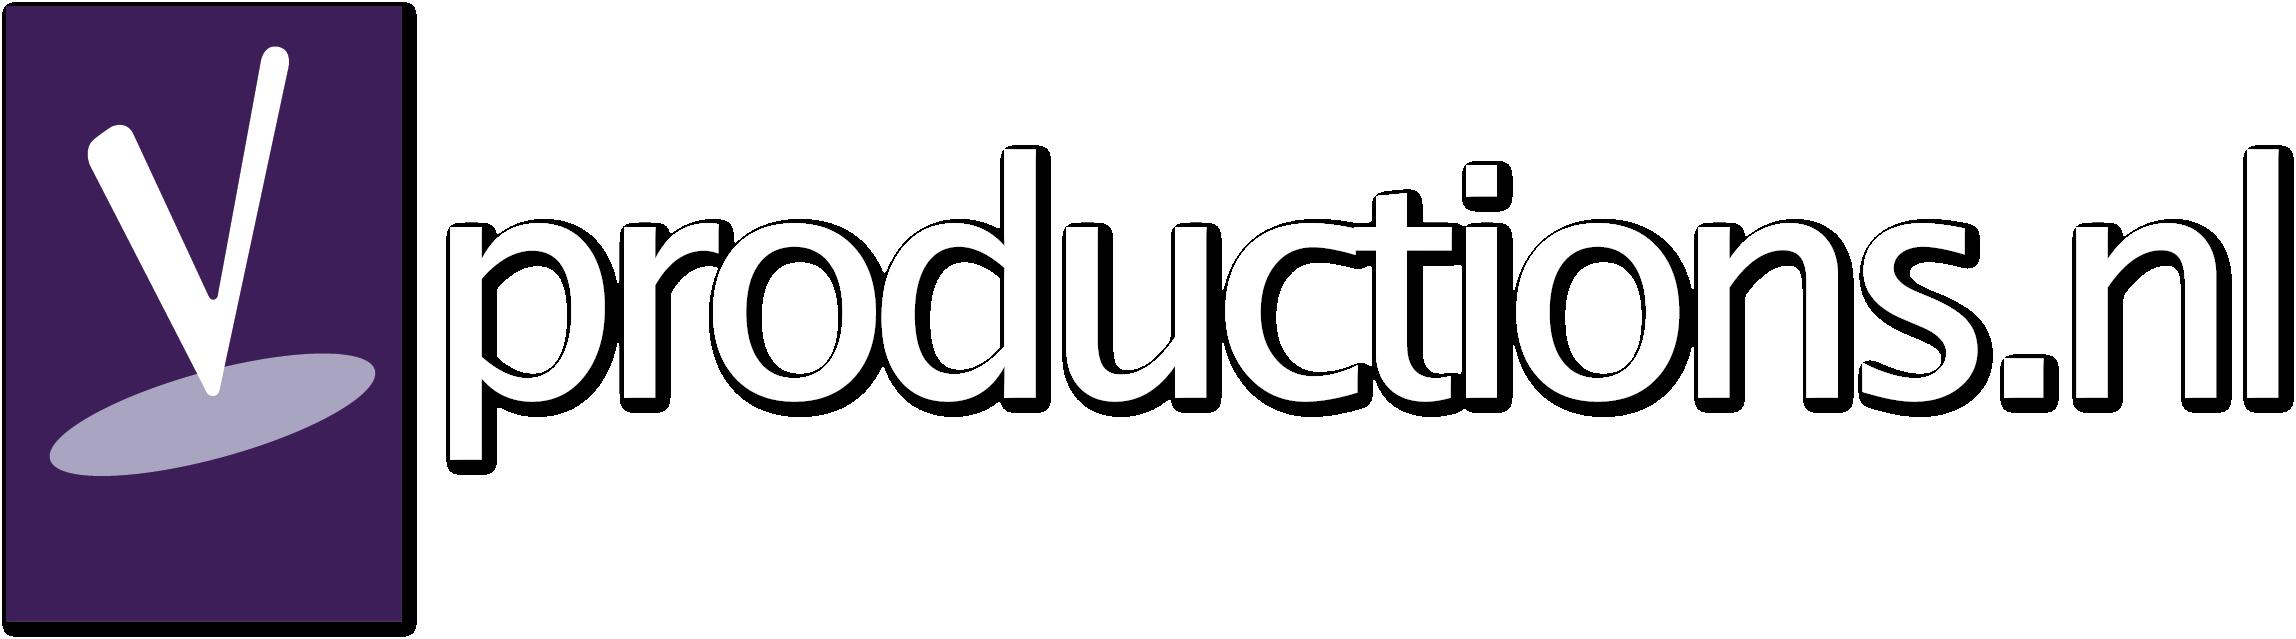 V-Productions